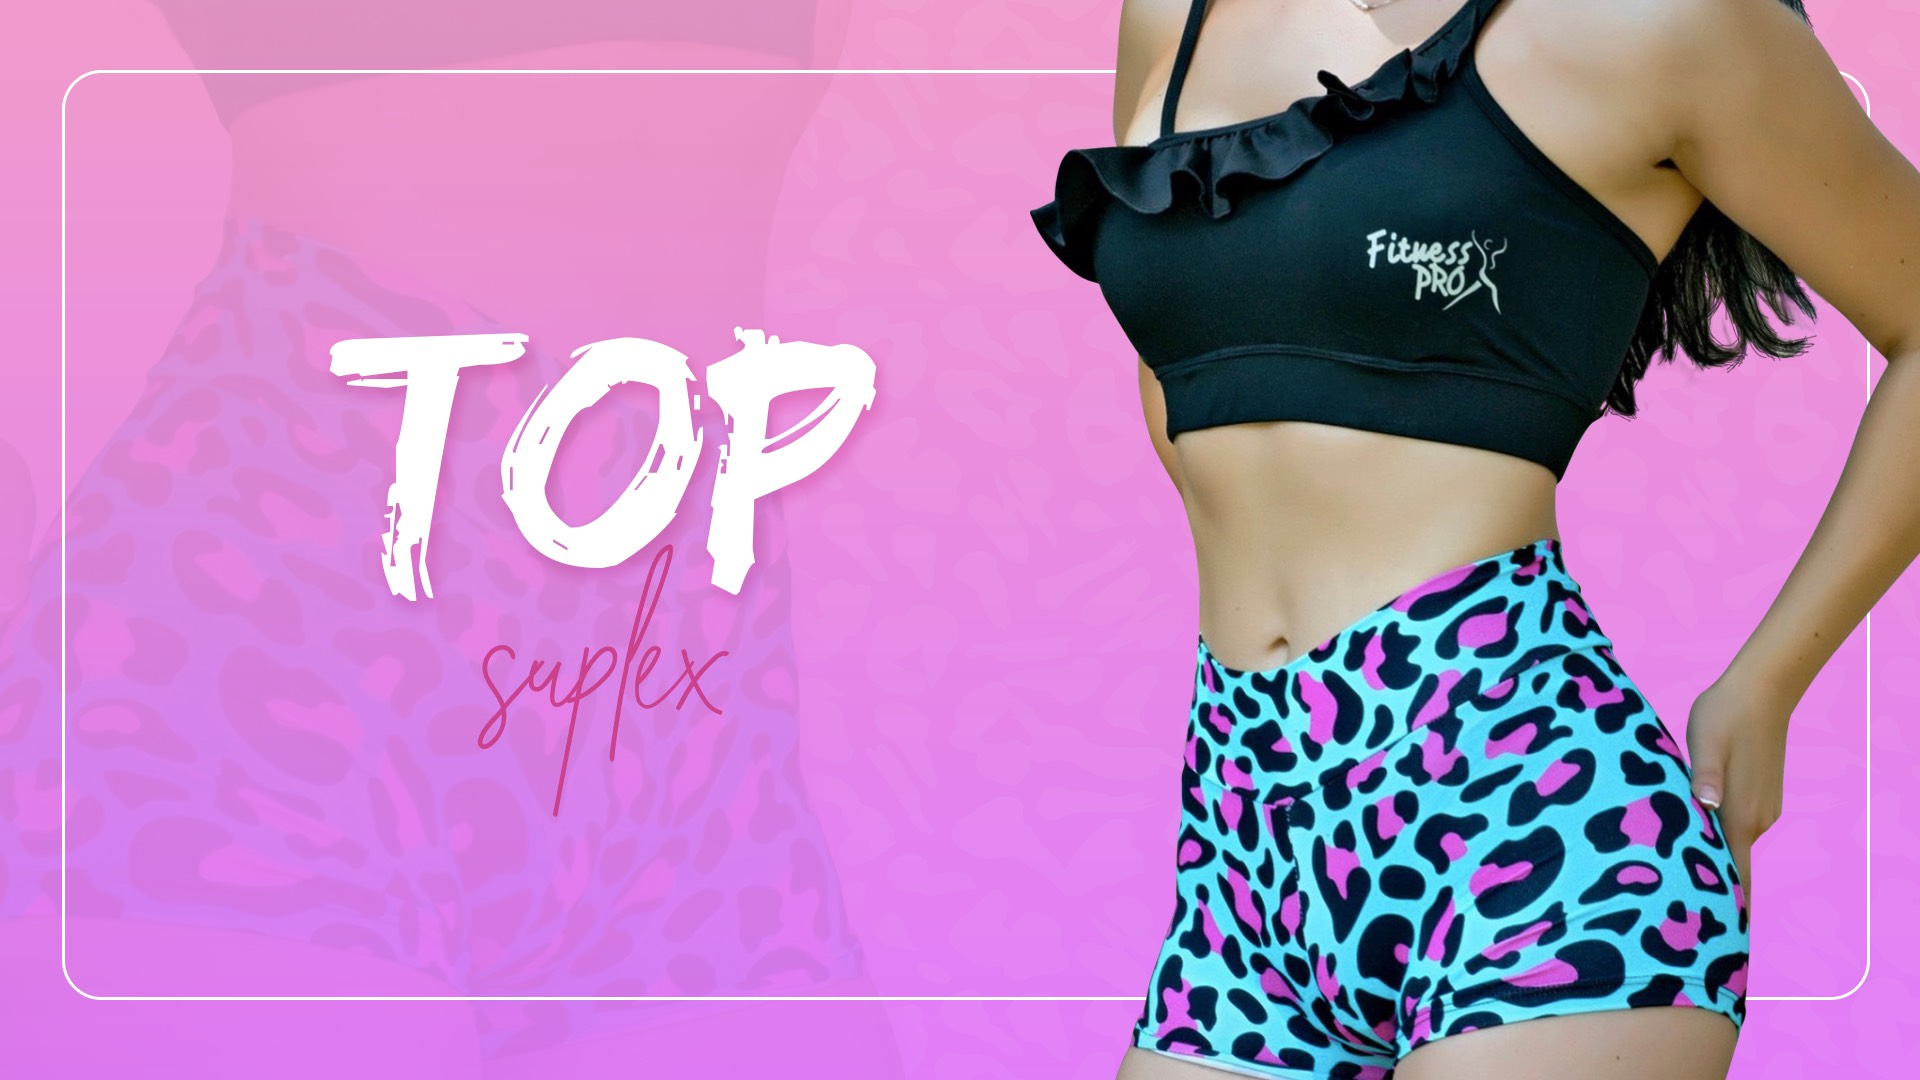 Fitness Pro - TOP Suplex